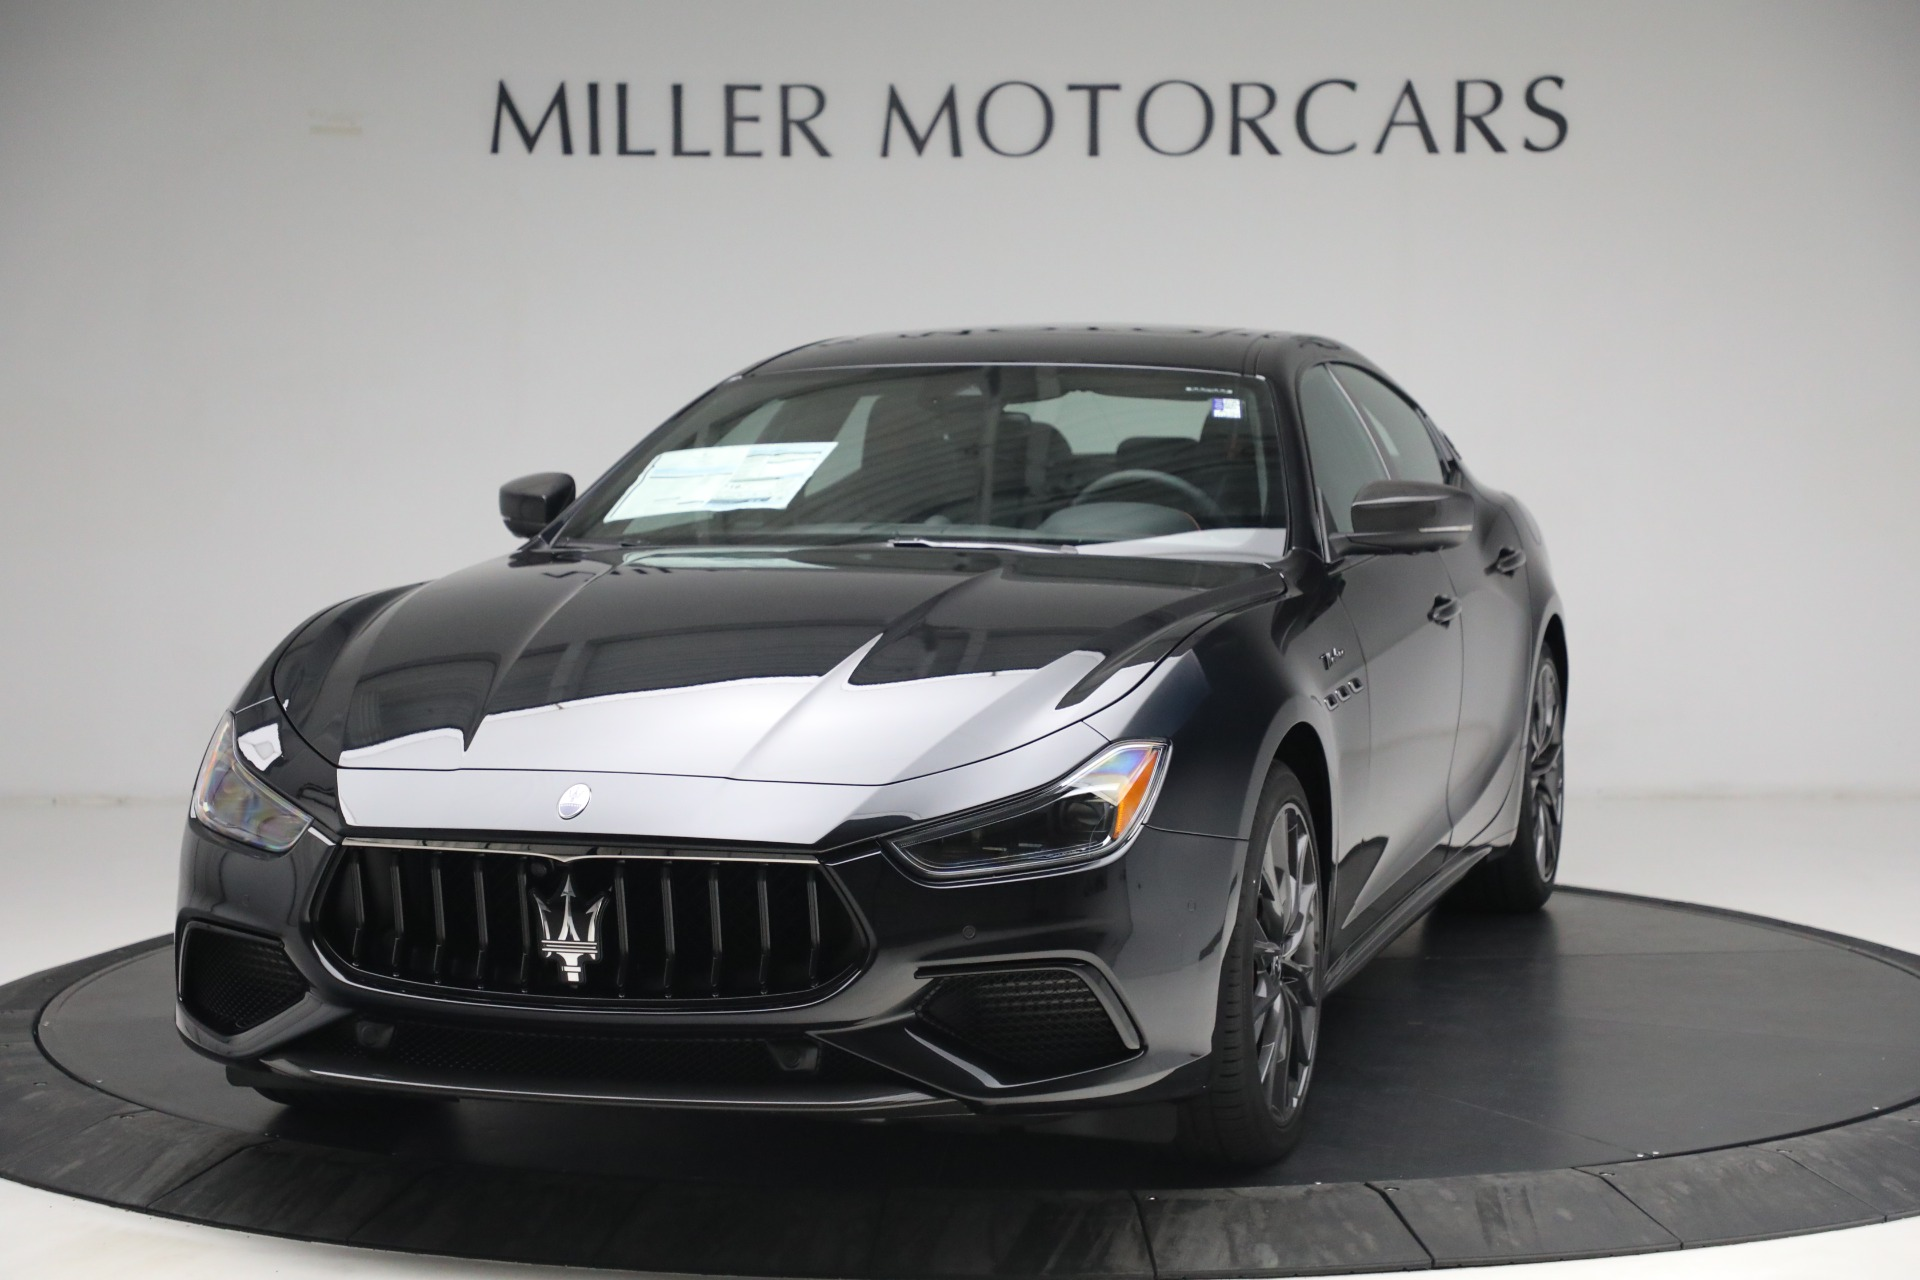 New 2022 Maserati Ghibli Modena Q4 for sale $103,855 at McLaren Greenwich in Greenwich CT 06830 1